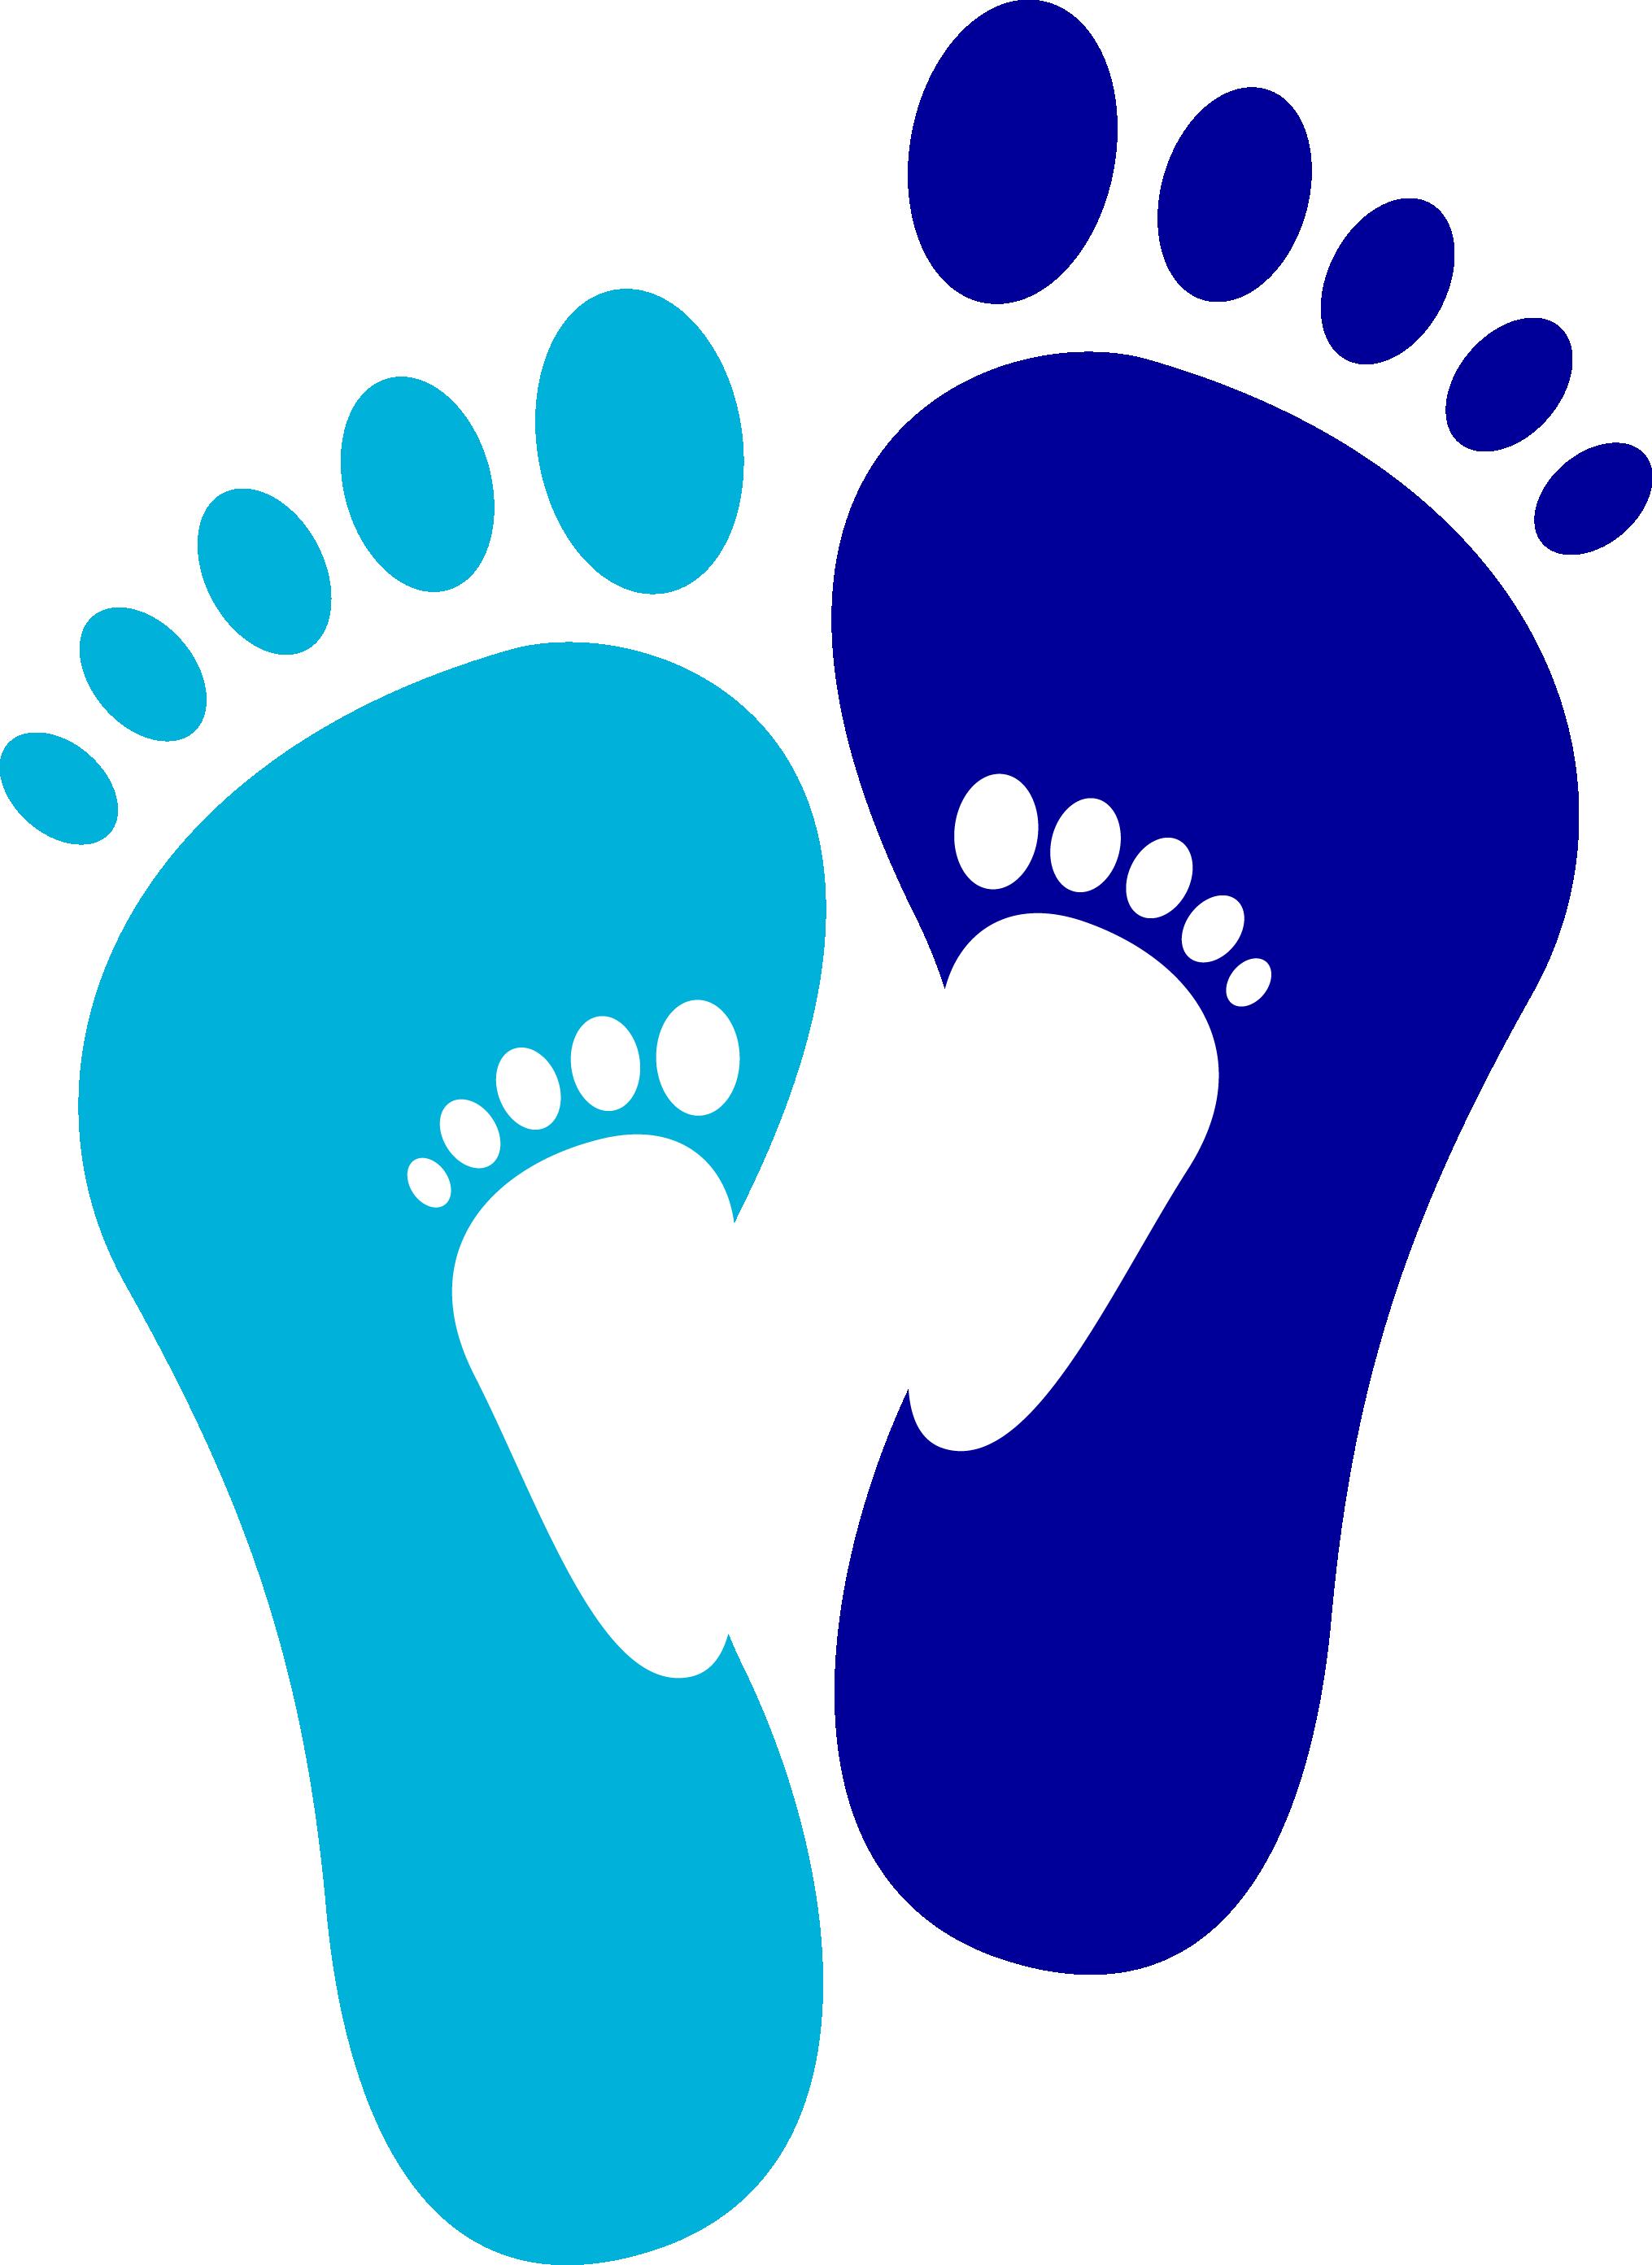 Footprint euclidean vector graphic. Footprints clipart blue